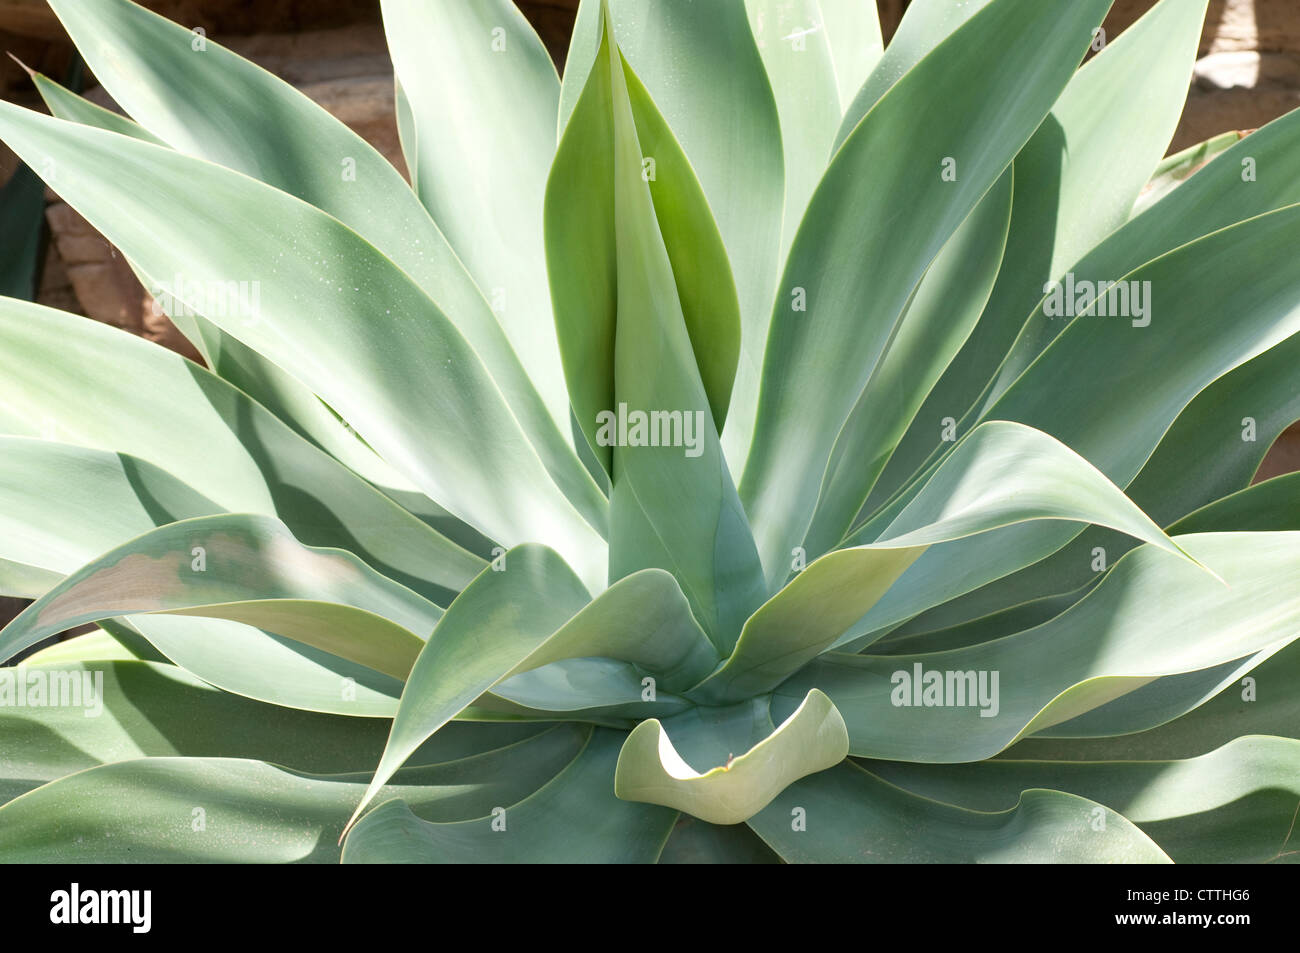 Agave attenuata plant - Stock Image